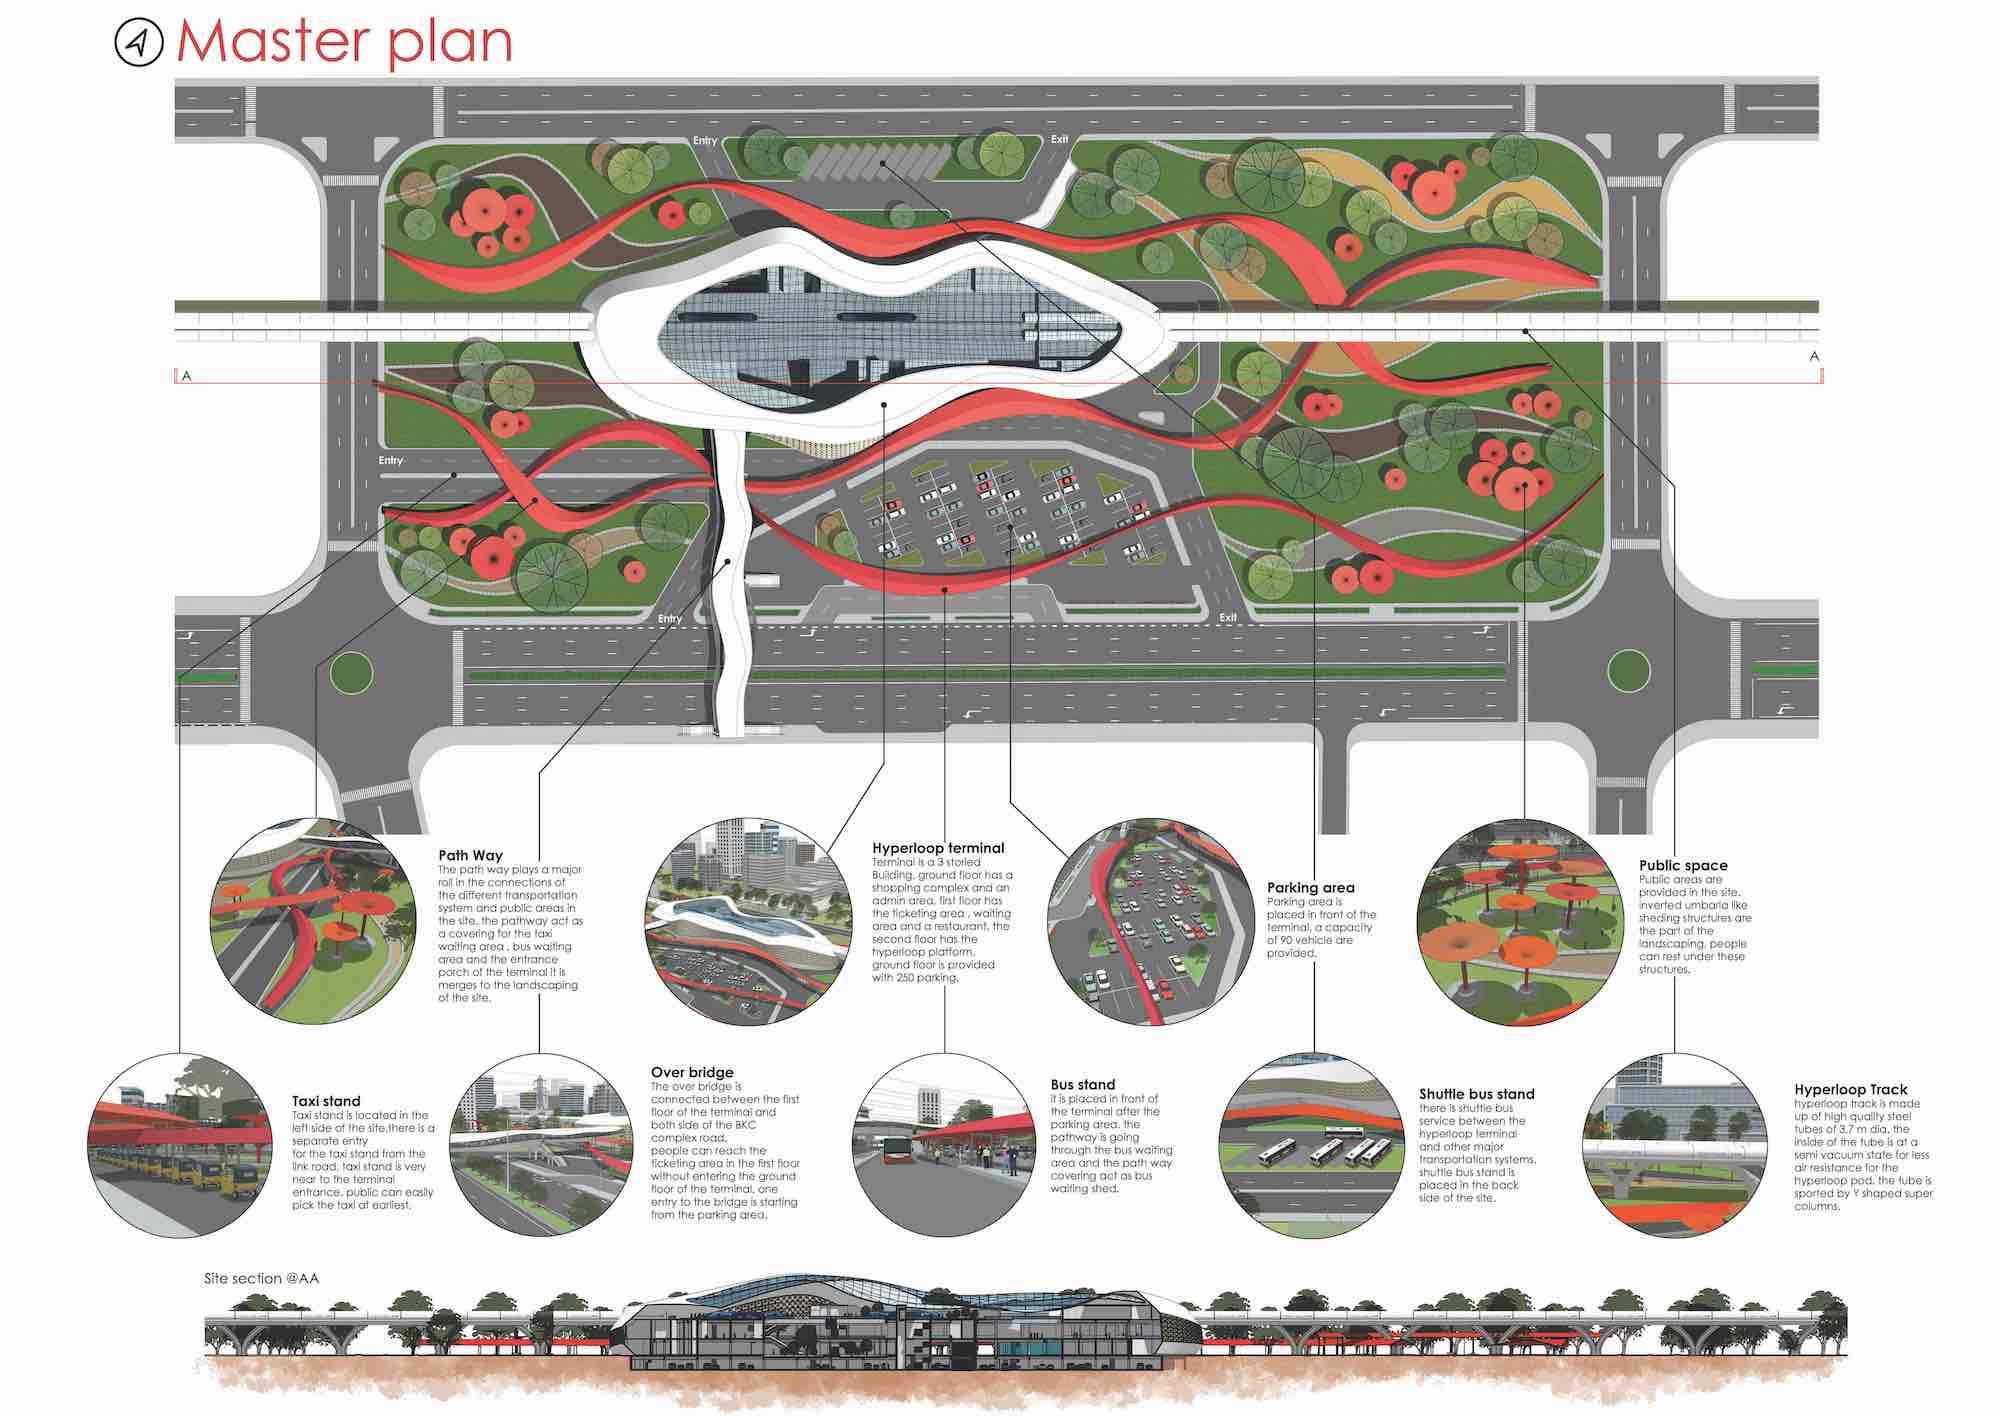 master plan of the hyperloop in Mumbai India